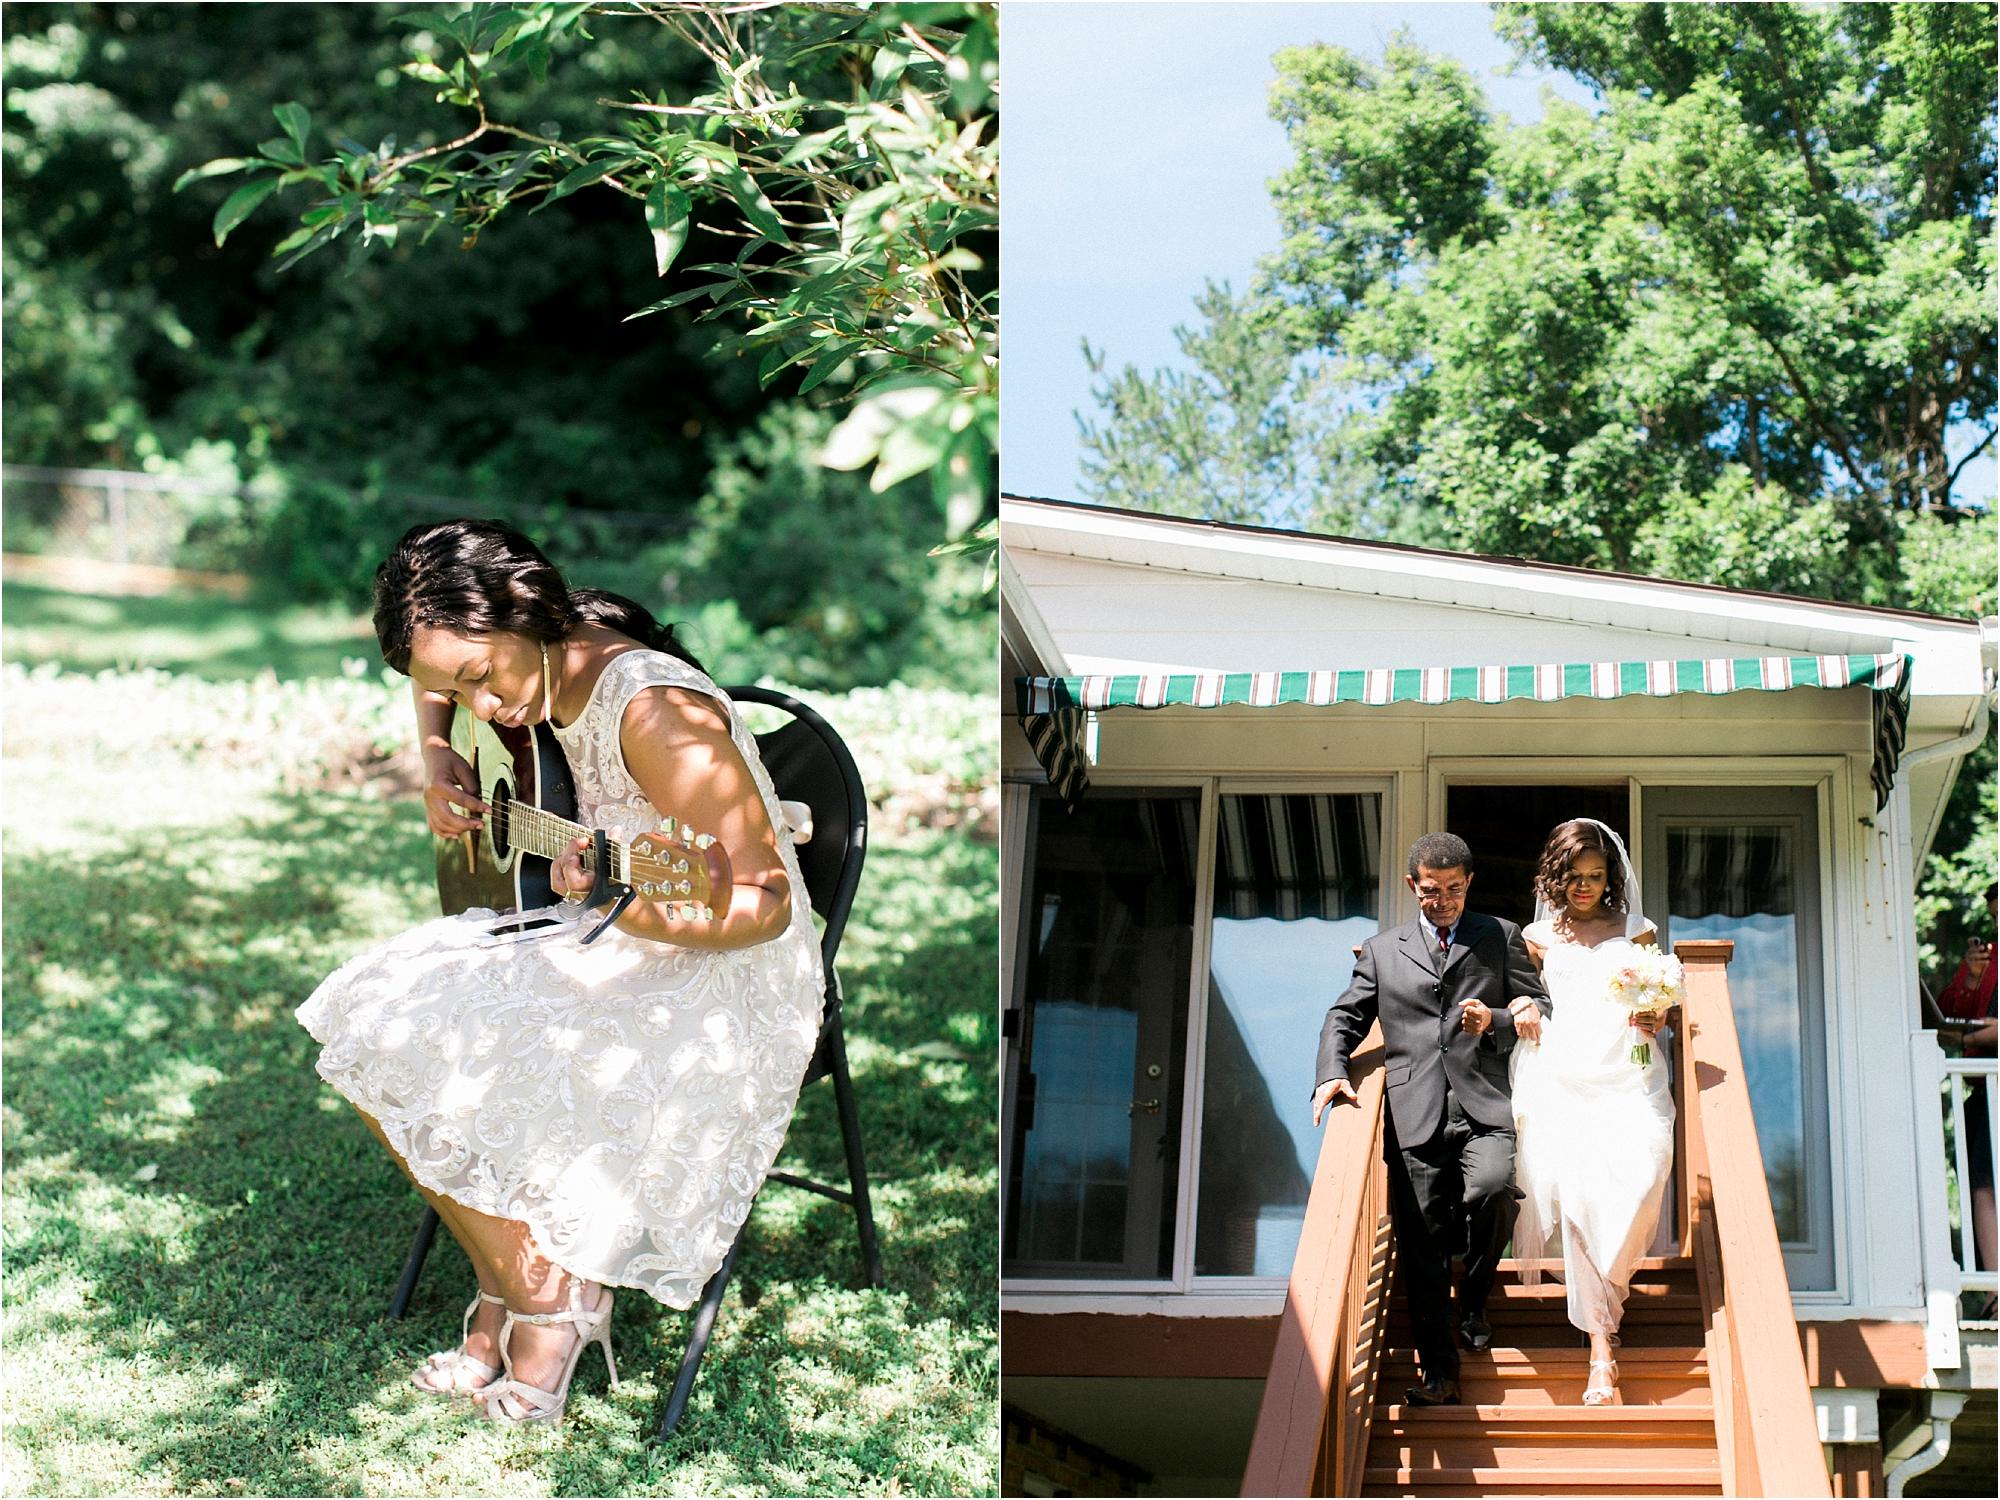 inimate-richmond-virginia-backyard-summer-wedding-photos_0005.jpg